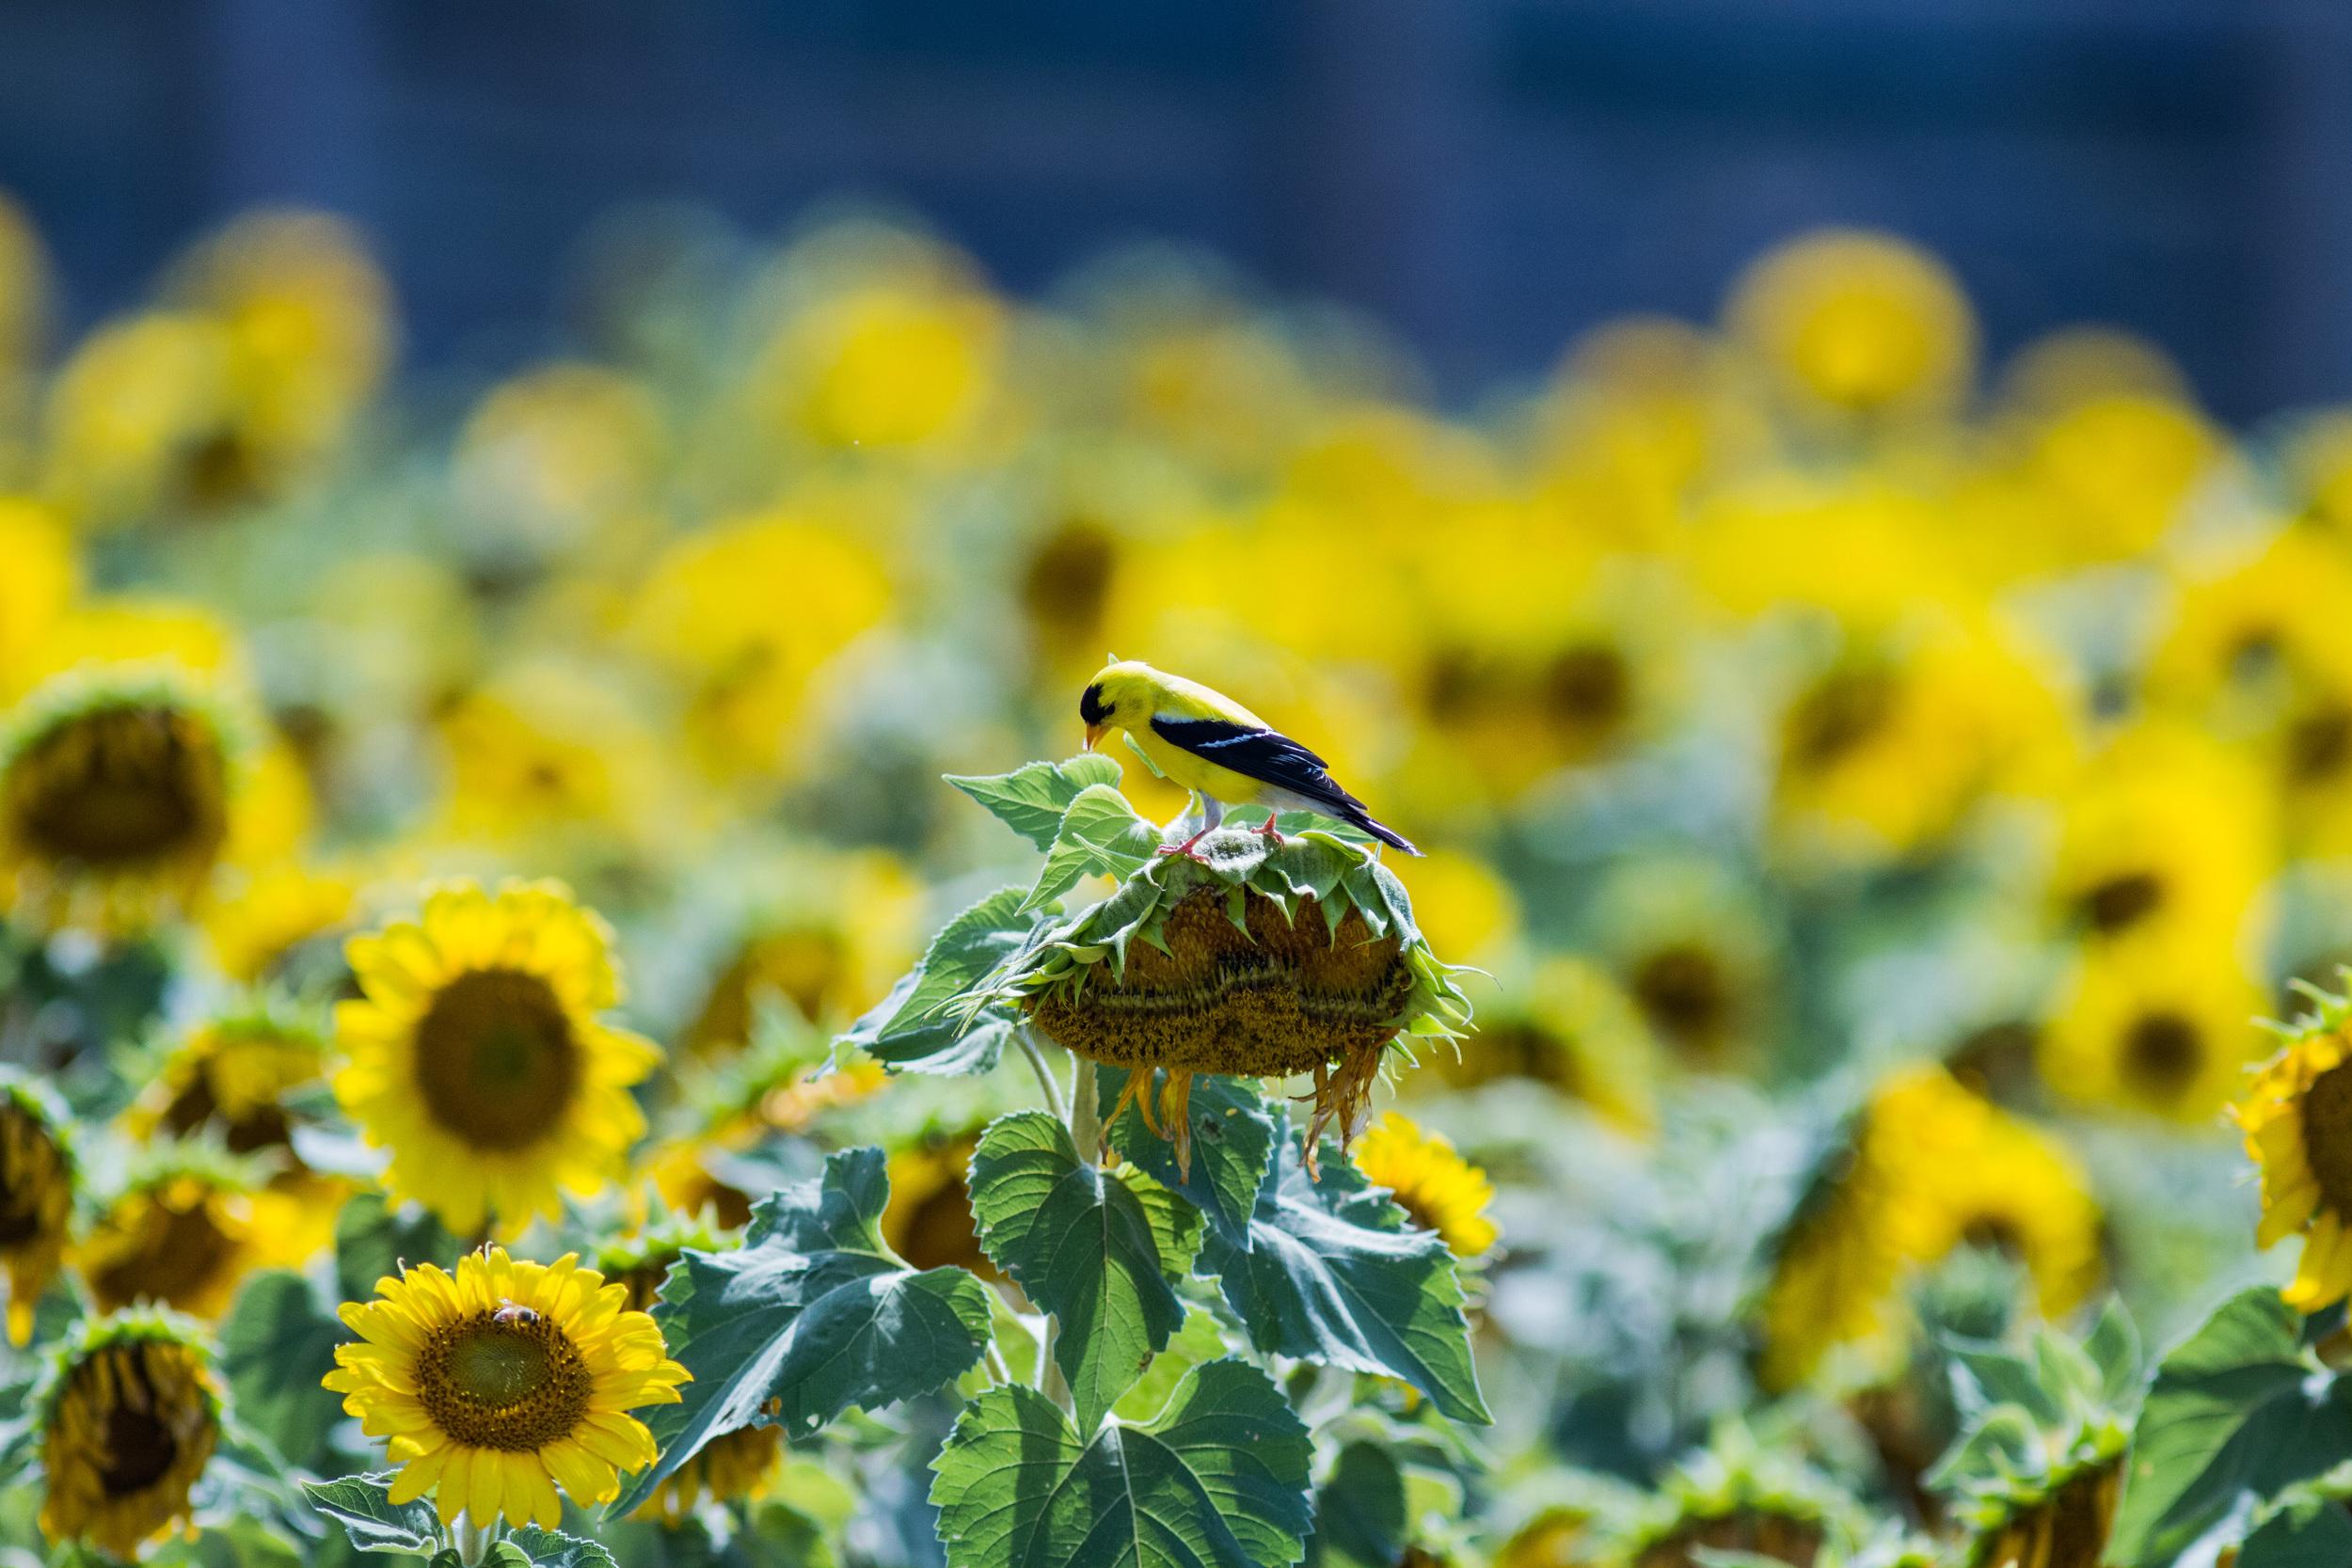 Bird_Sunflowers.jpg